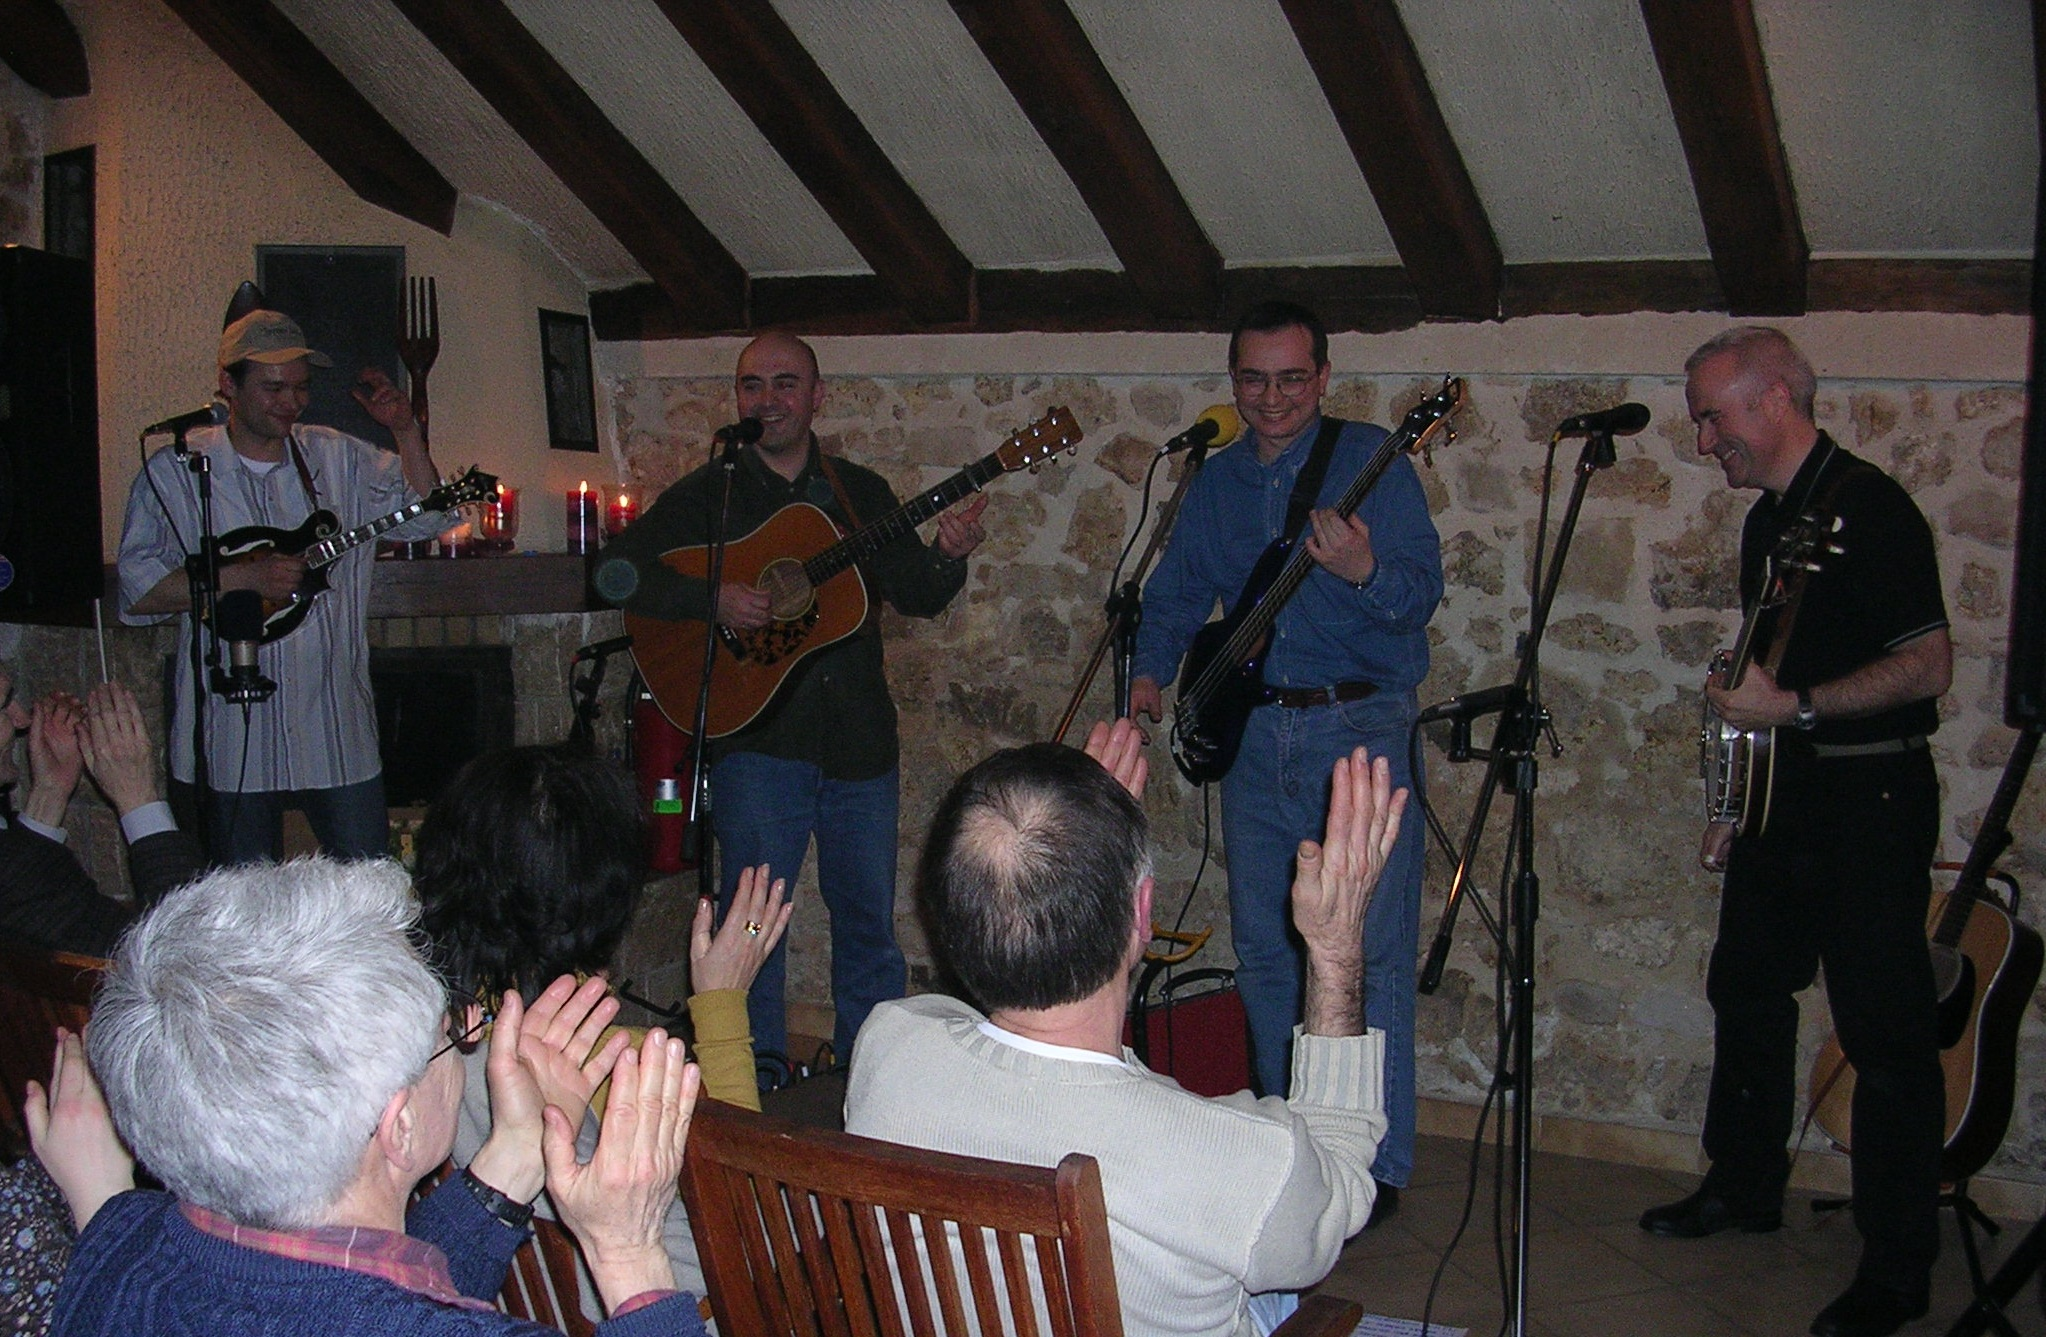 World Fest Music ou Day Fest Country & Bluegrass janvier 2008 Darvault